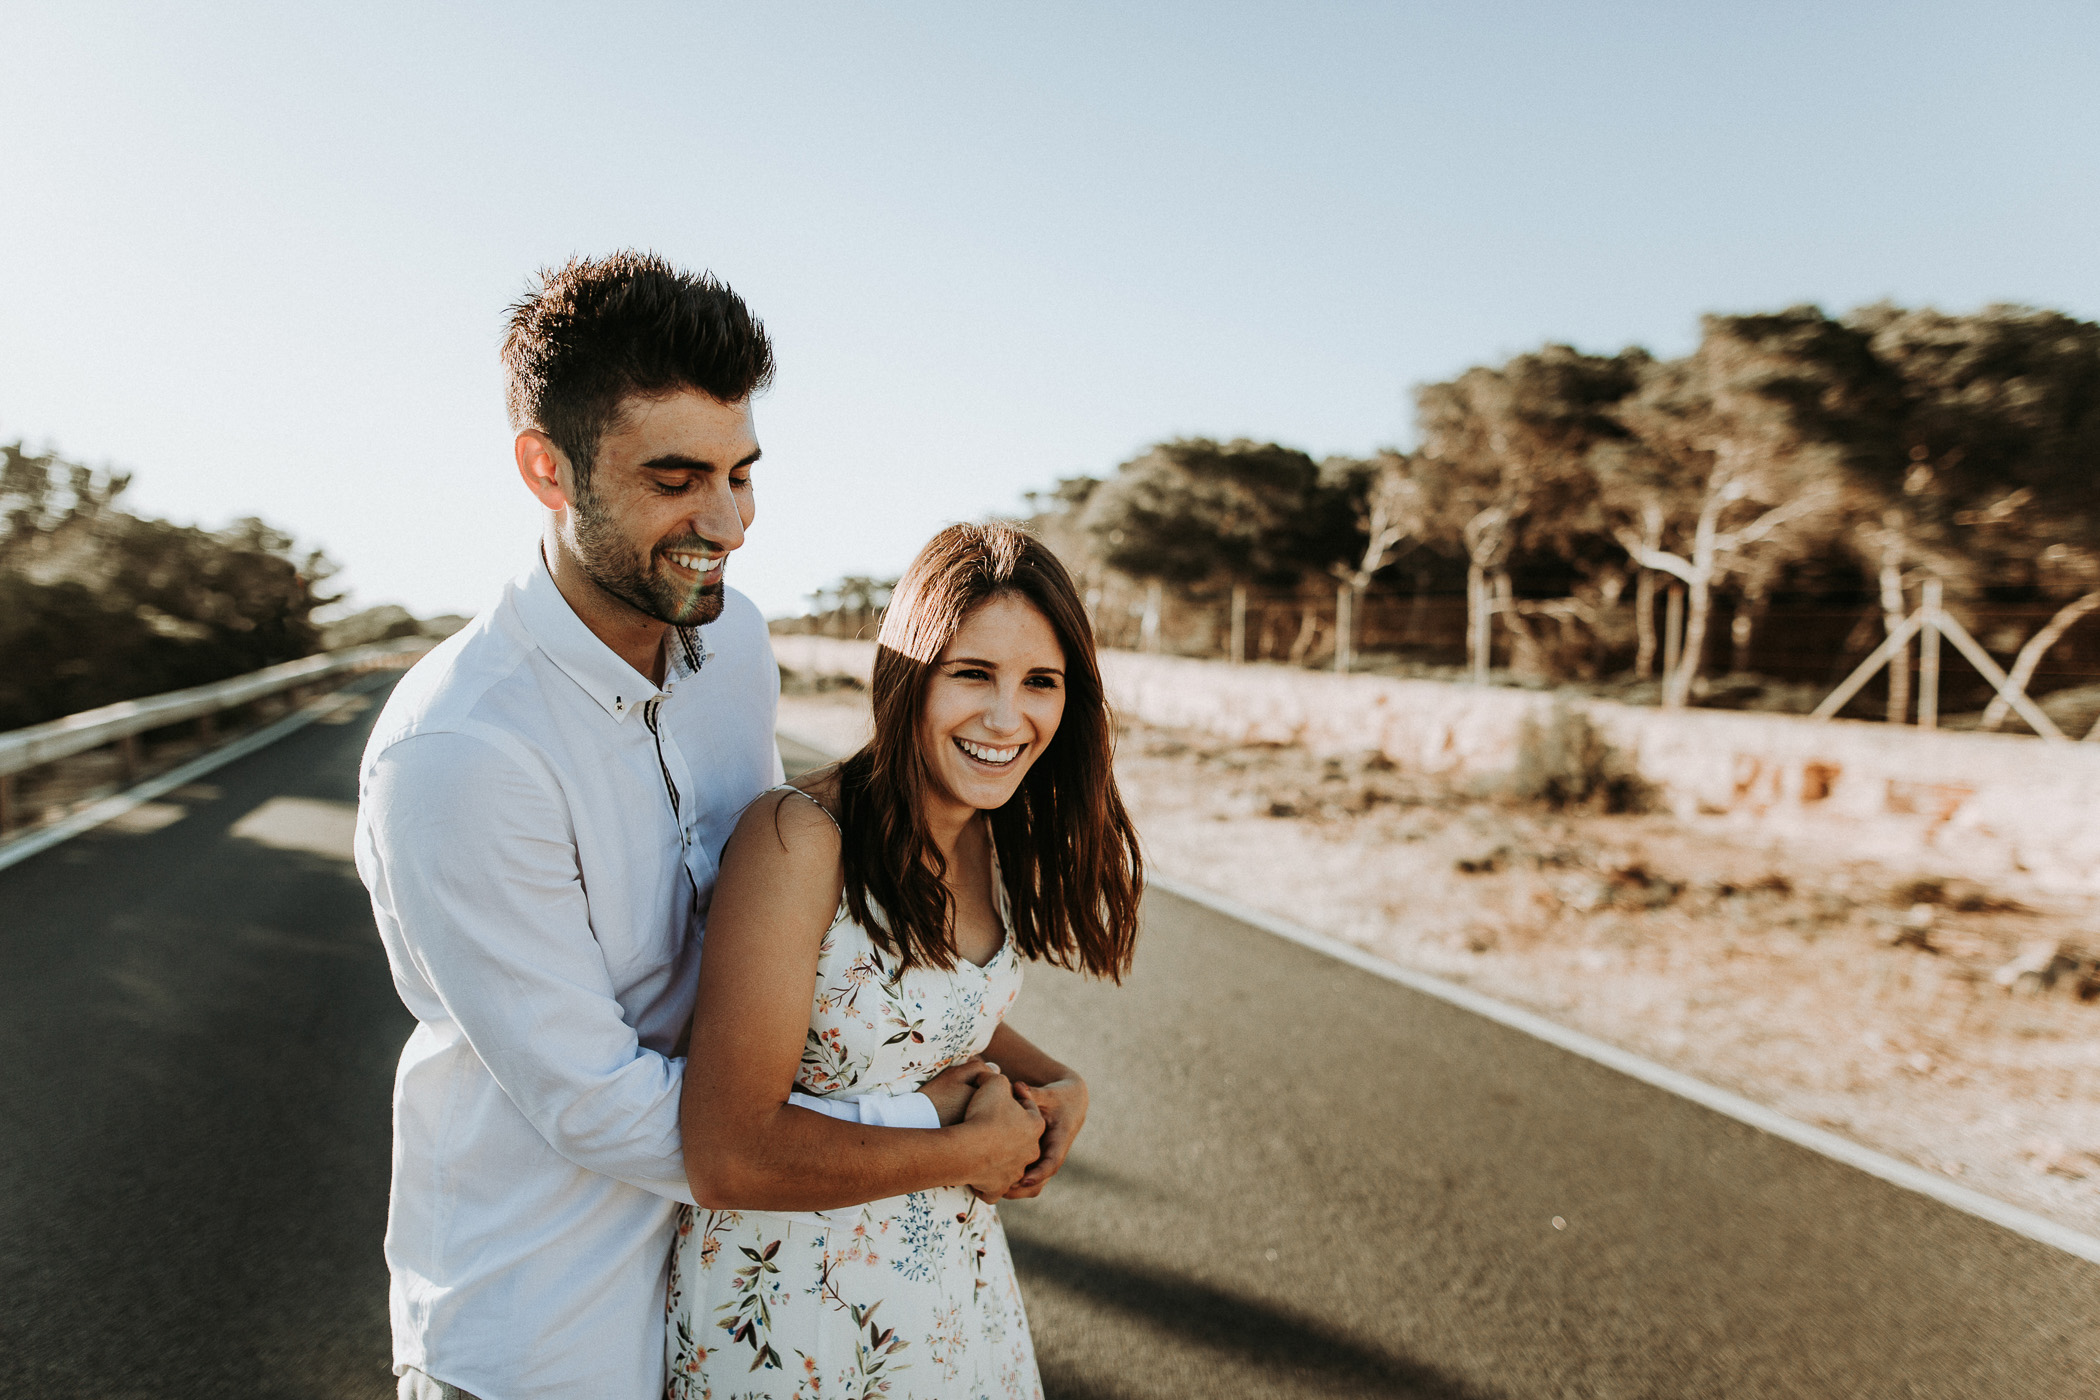 DanielaMarquardtPhotography_wedding_elopement_mallorca_spain_calapi_palma_lauraandtoni_410